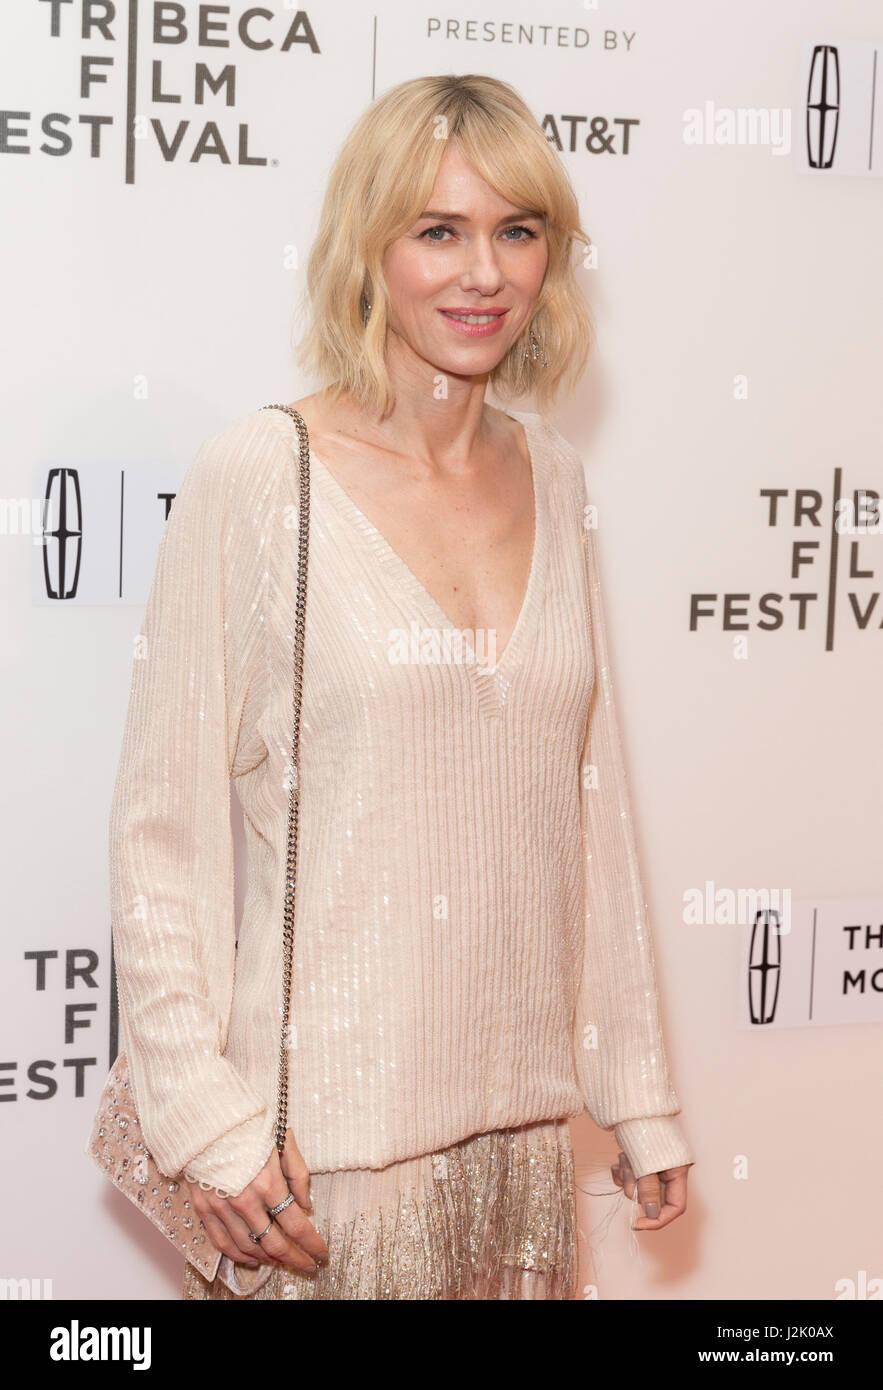 New York, États-Unis. Apr 28, 2017. New York, NY USA - 28 Avril 2017: Naomi Watts assiste à la première Photo Stock